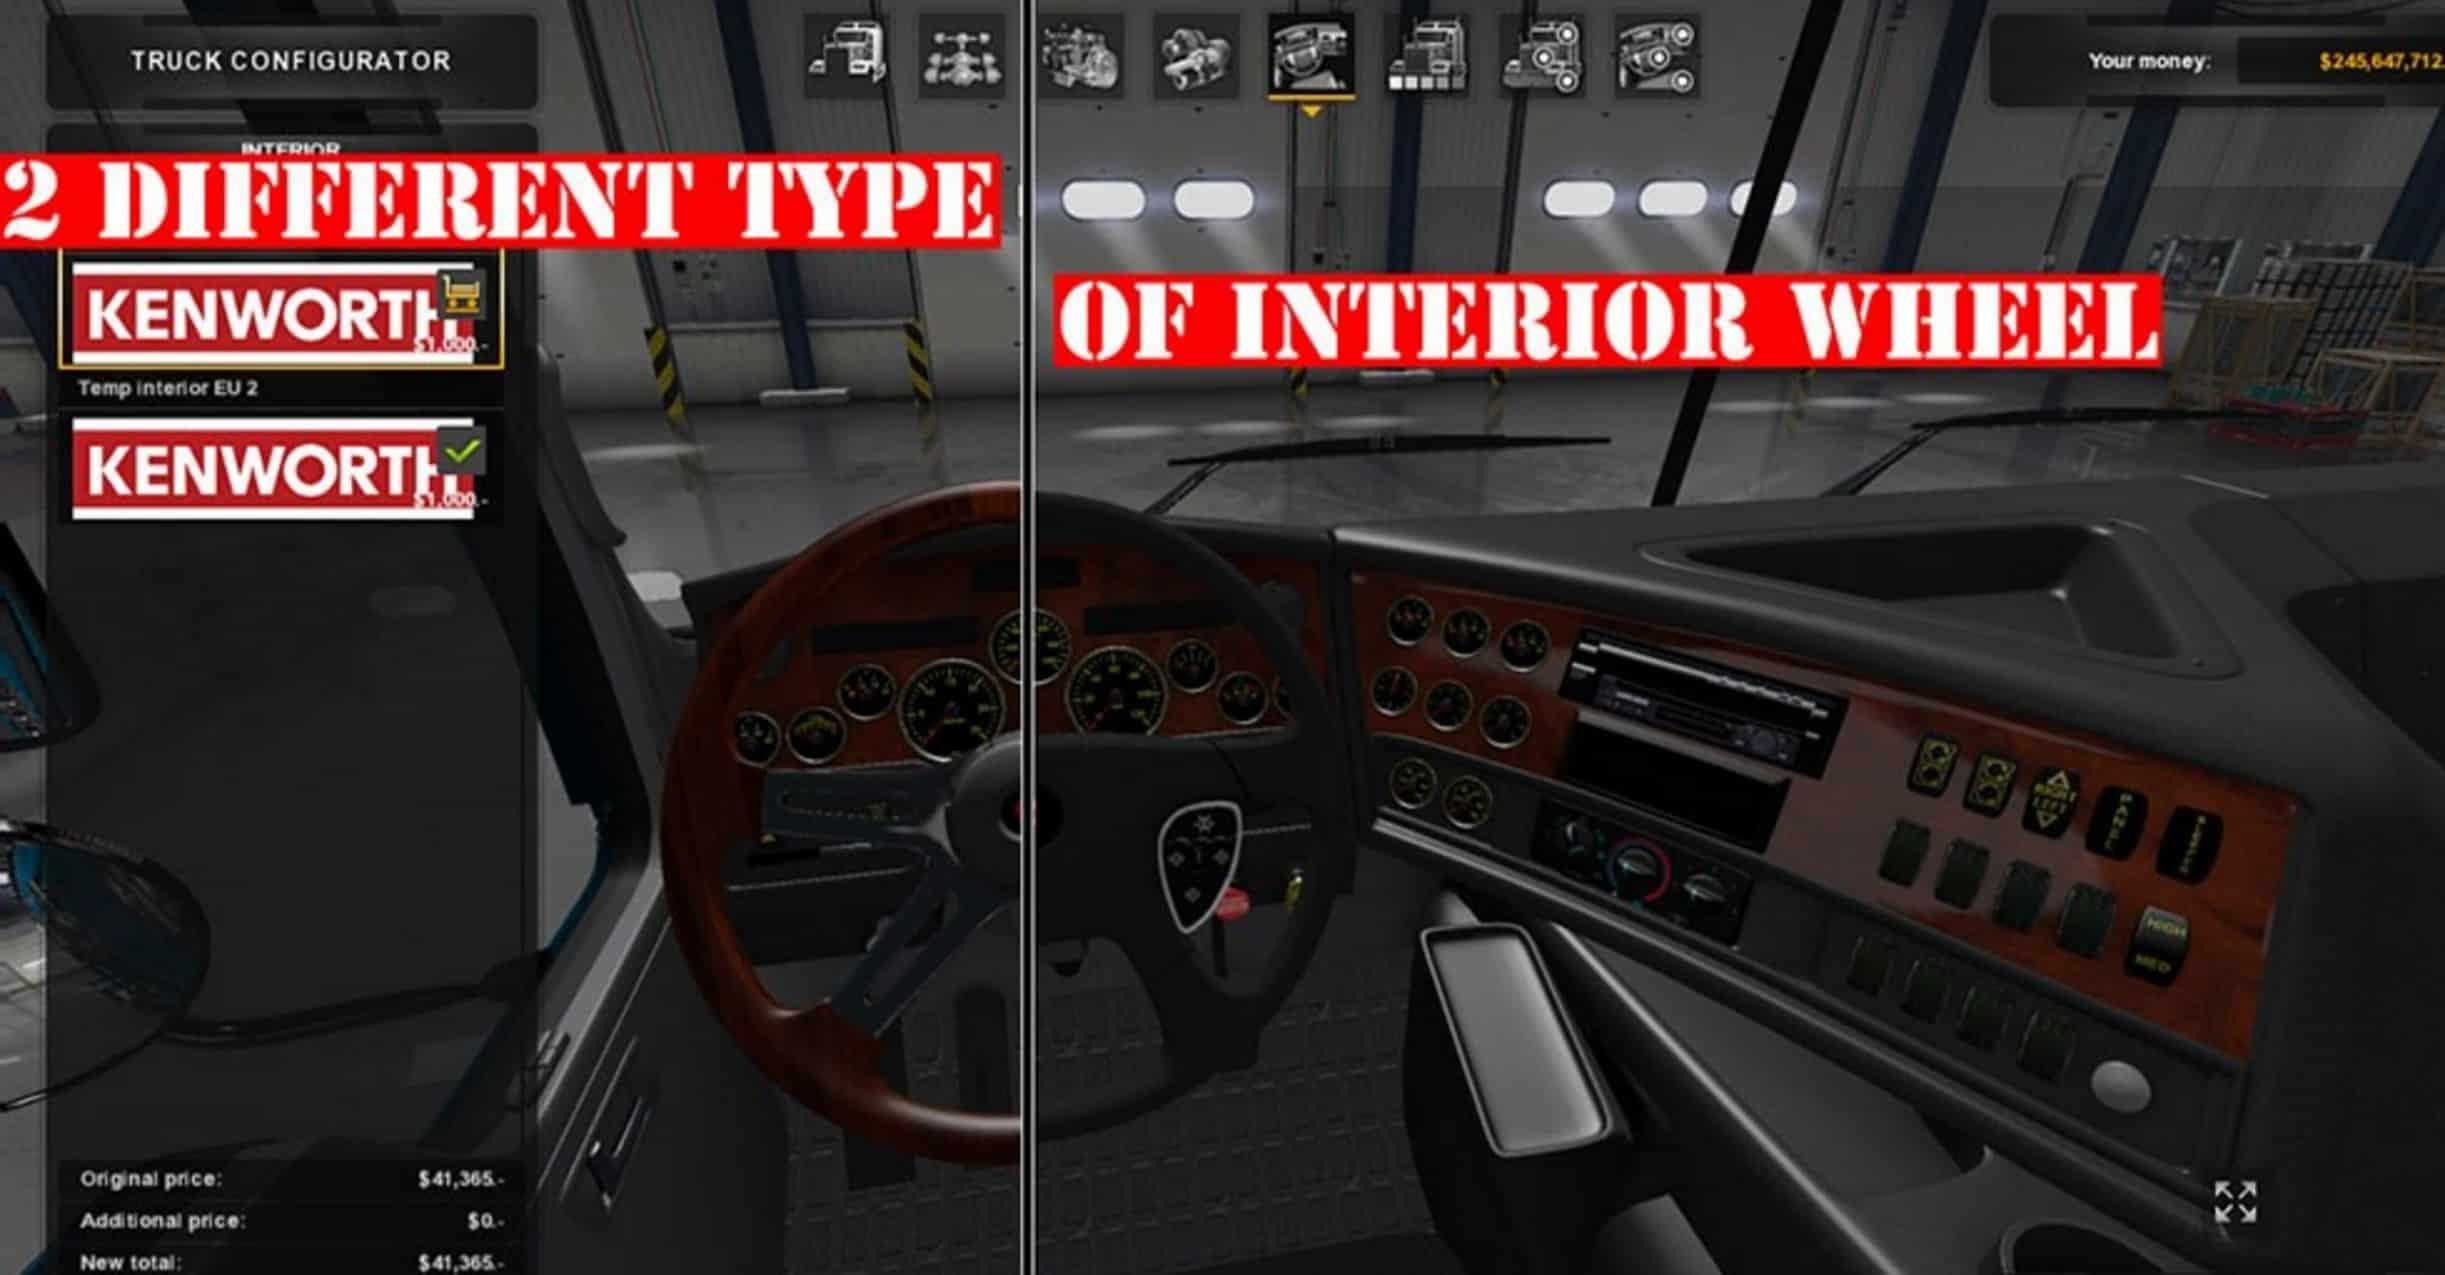 Kenworth K200 For ATS American Truck Simulator Mod ATS Mod